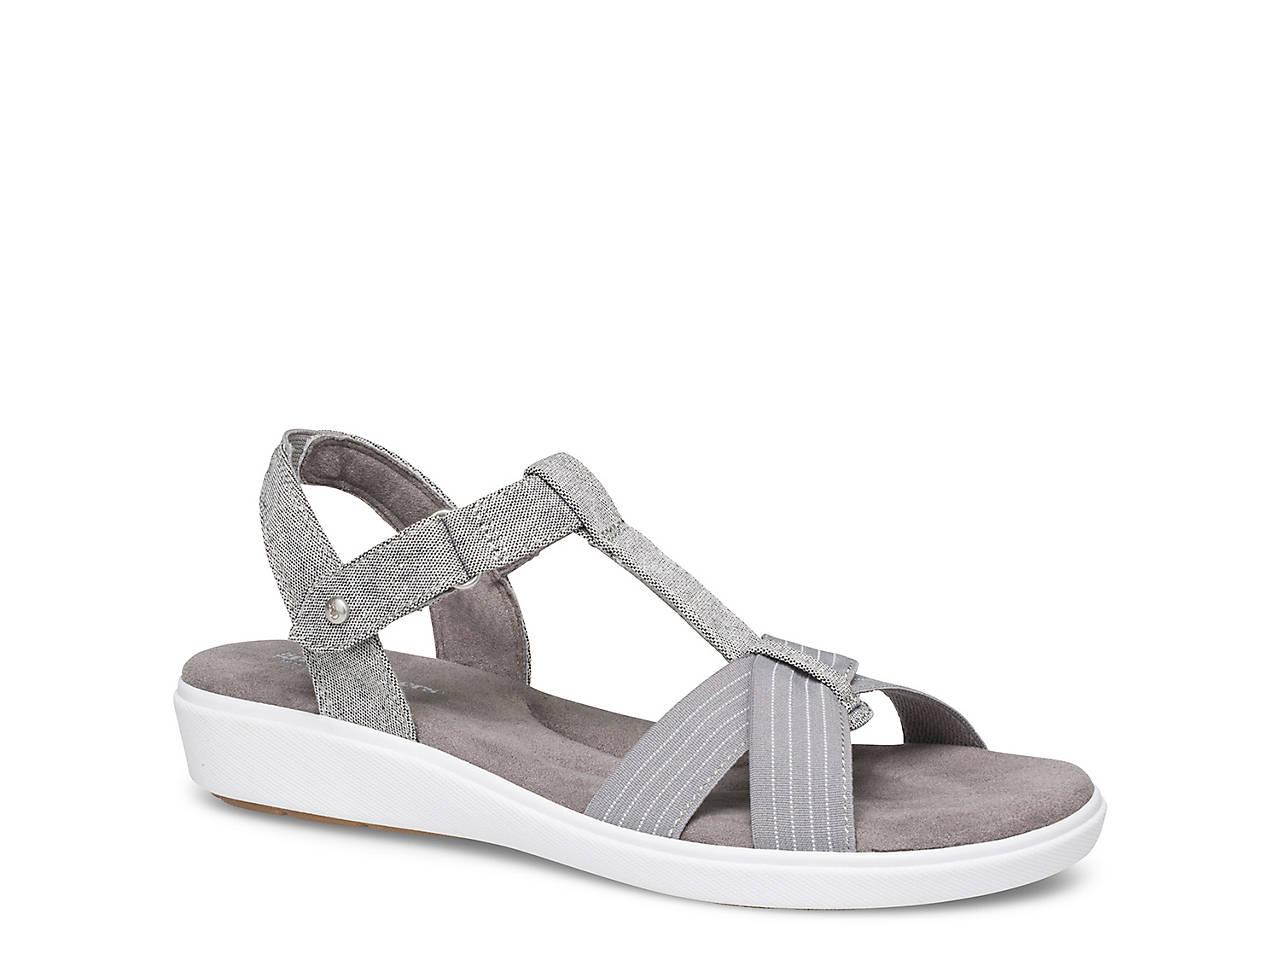 b489266430bb Grasshoppers Ruby Wedge Sandal Women s Shoes